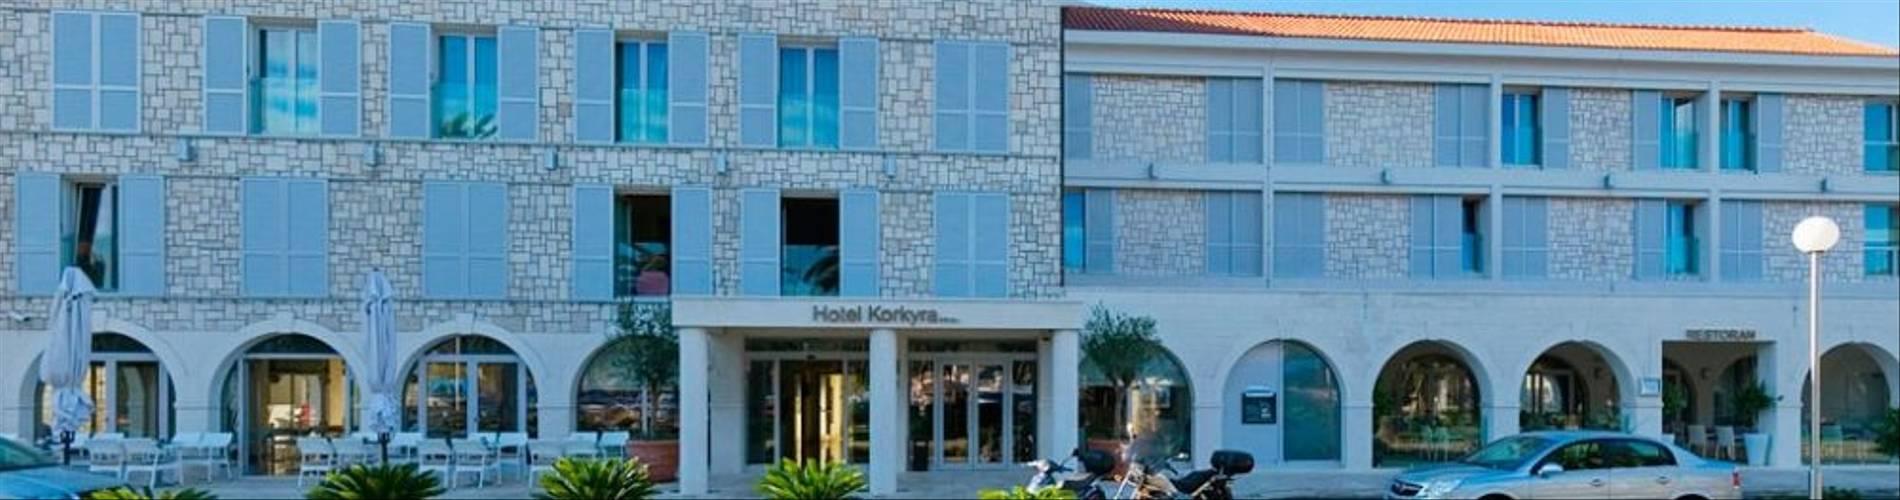 Hotel-Korkyra-outside.jpg